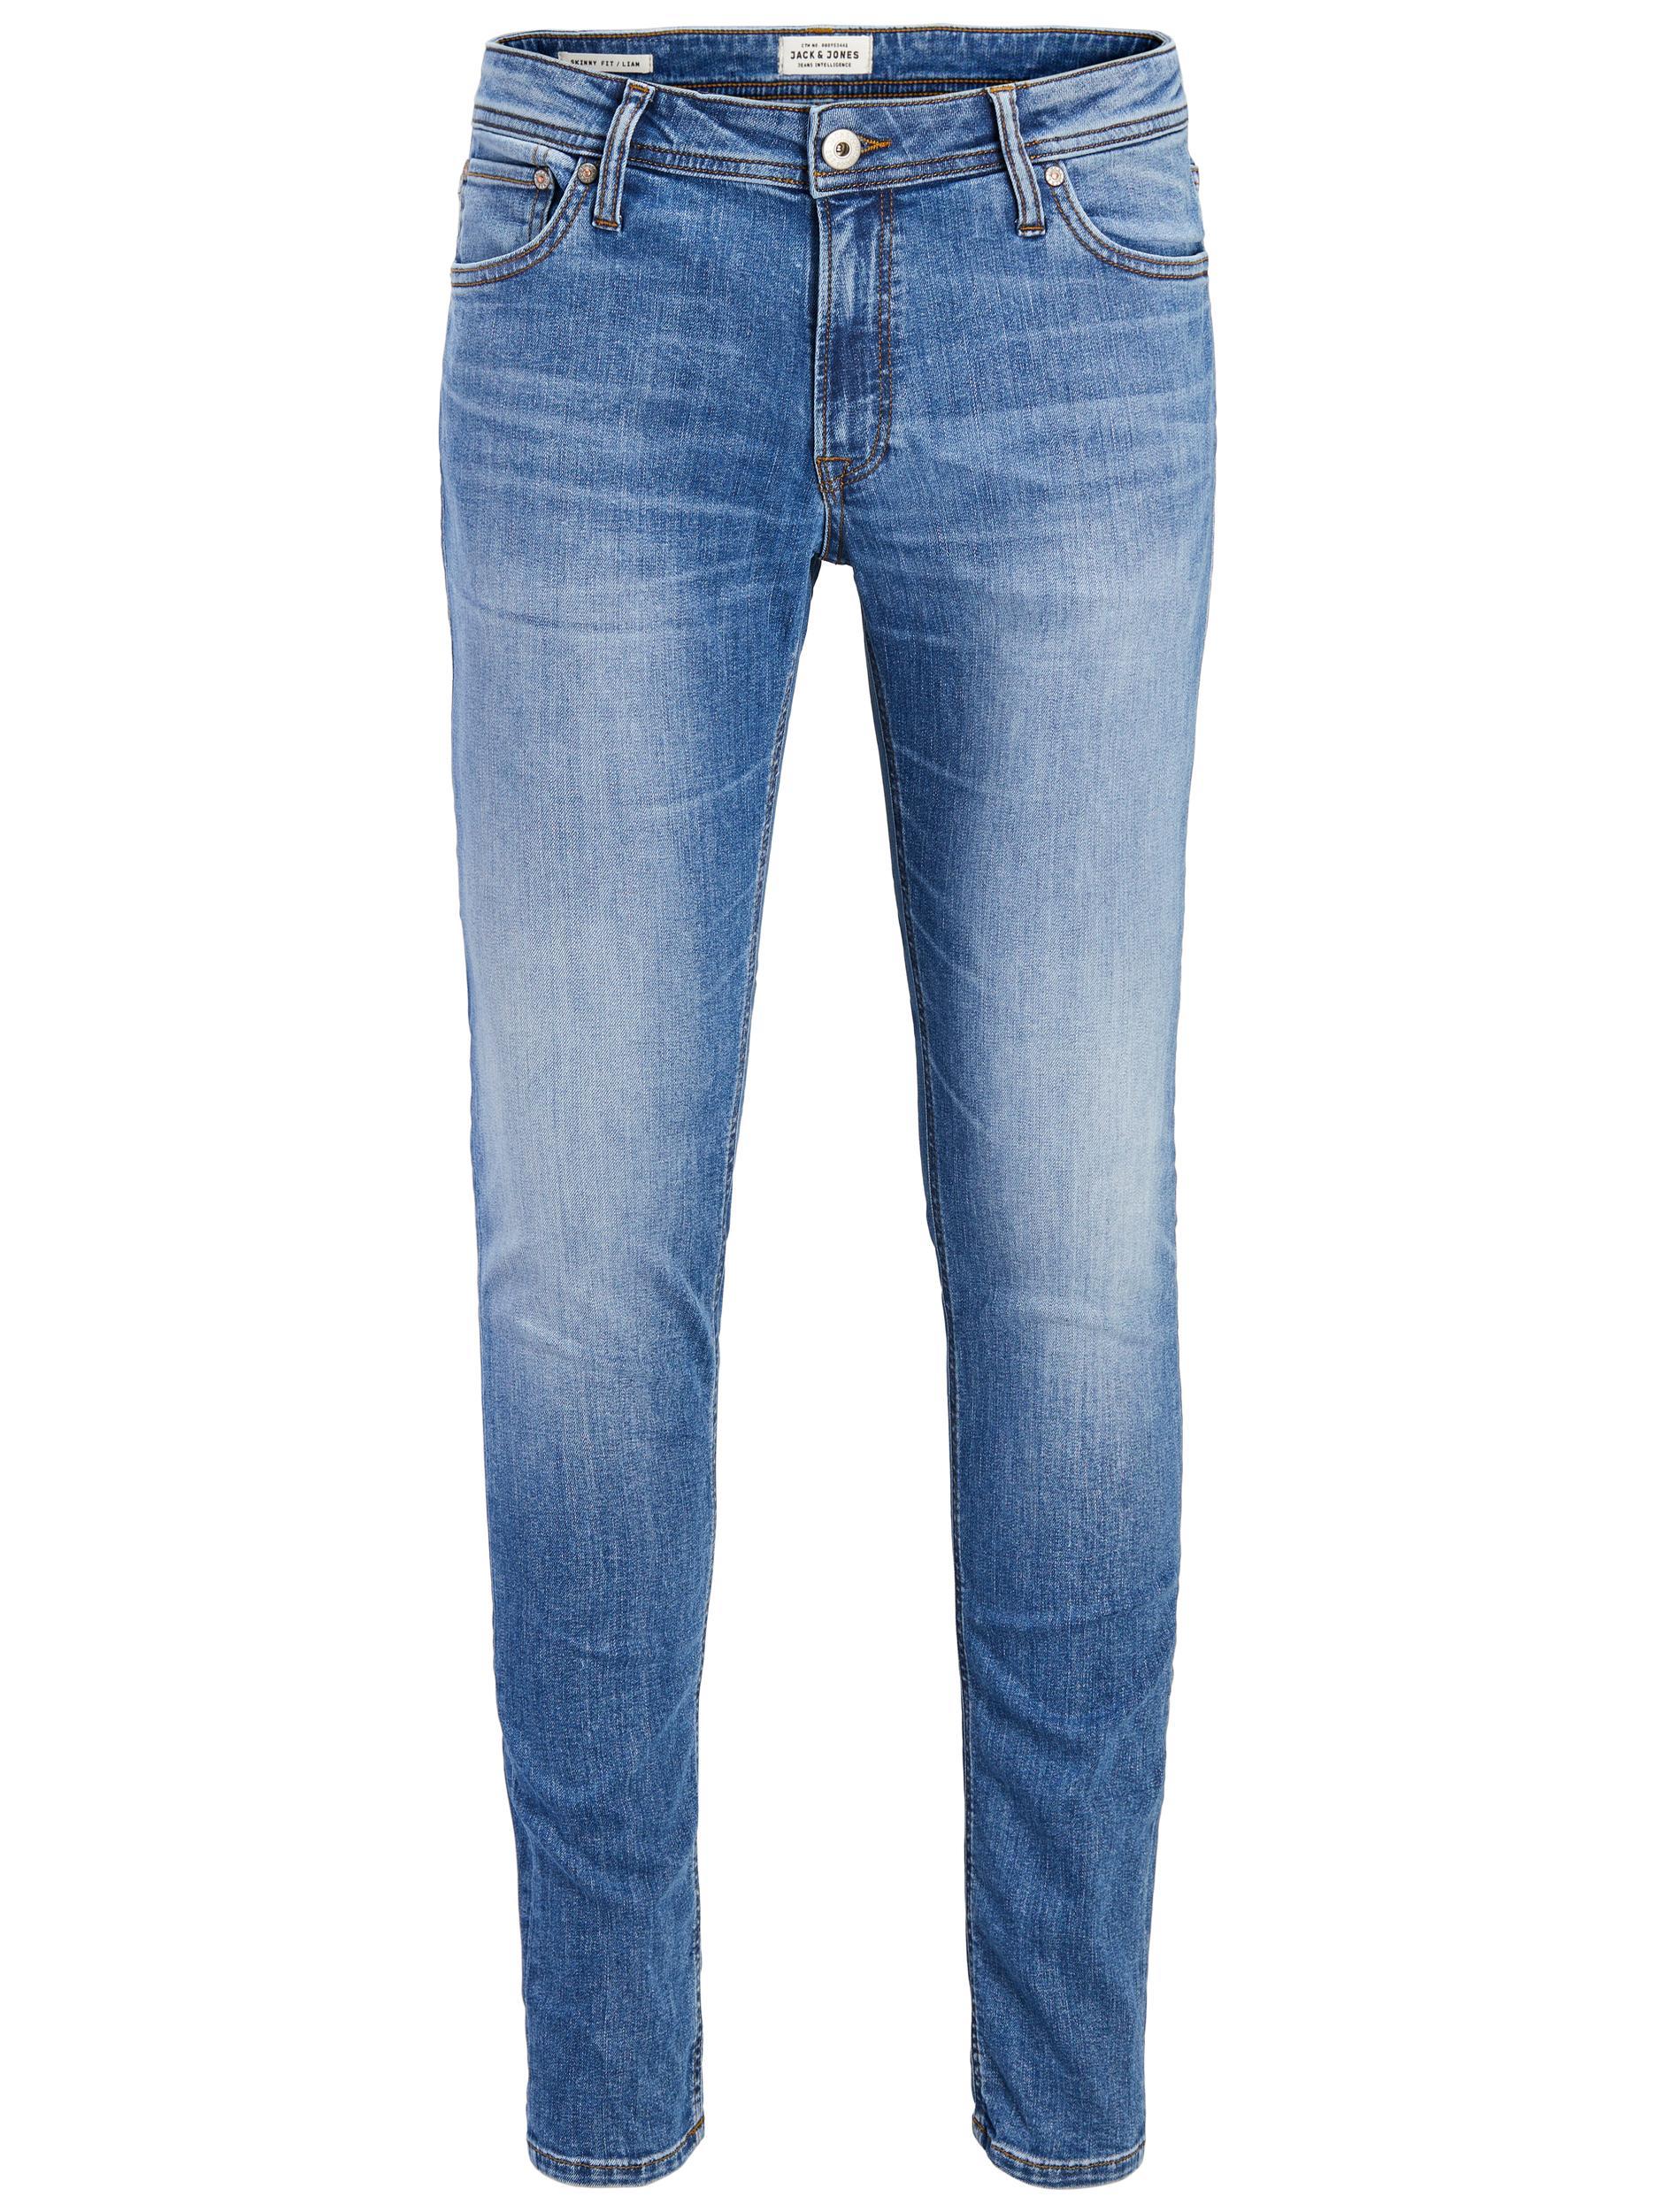 Jack & Jones Liam Original 815 jeans, blue denim, 128